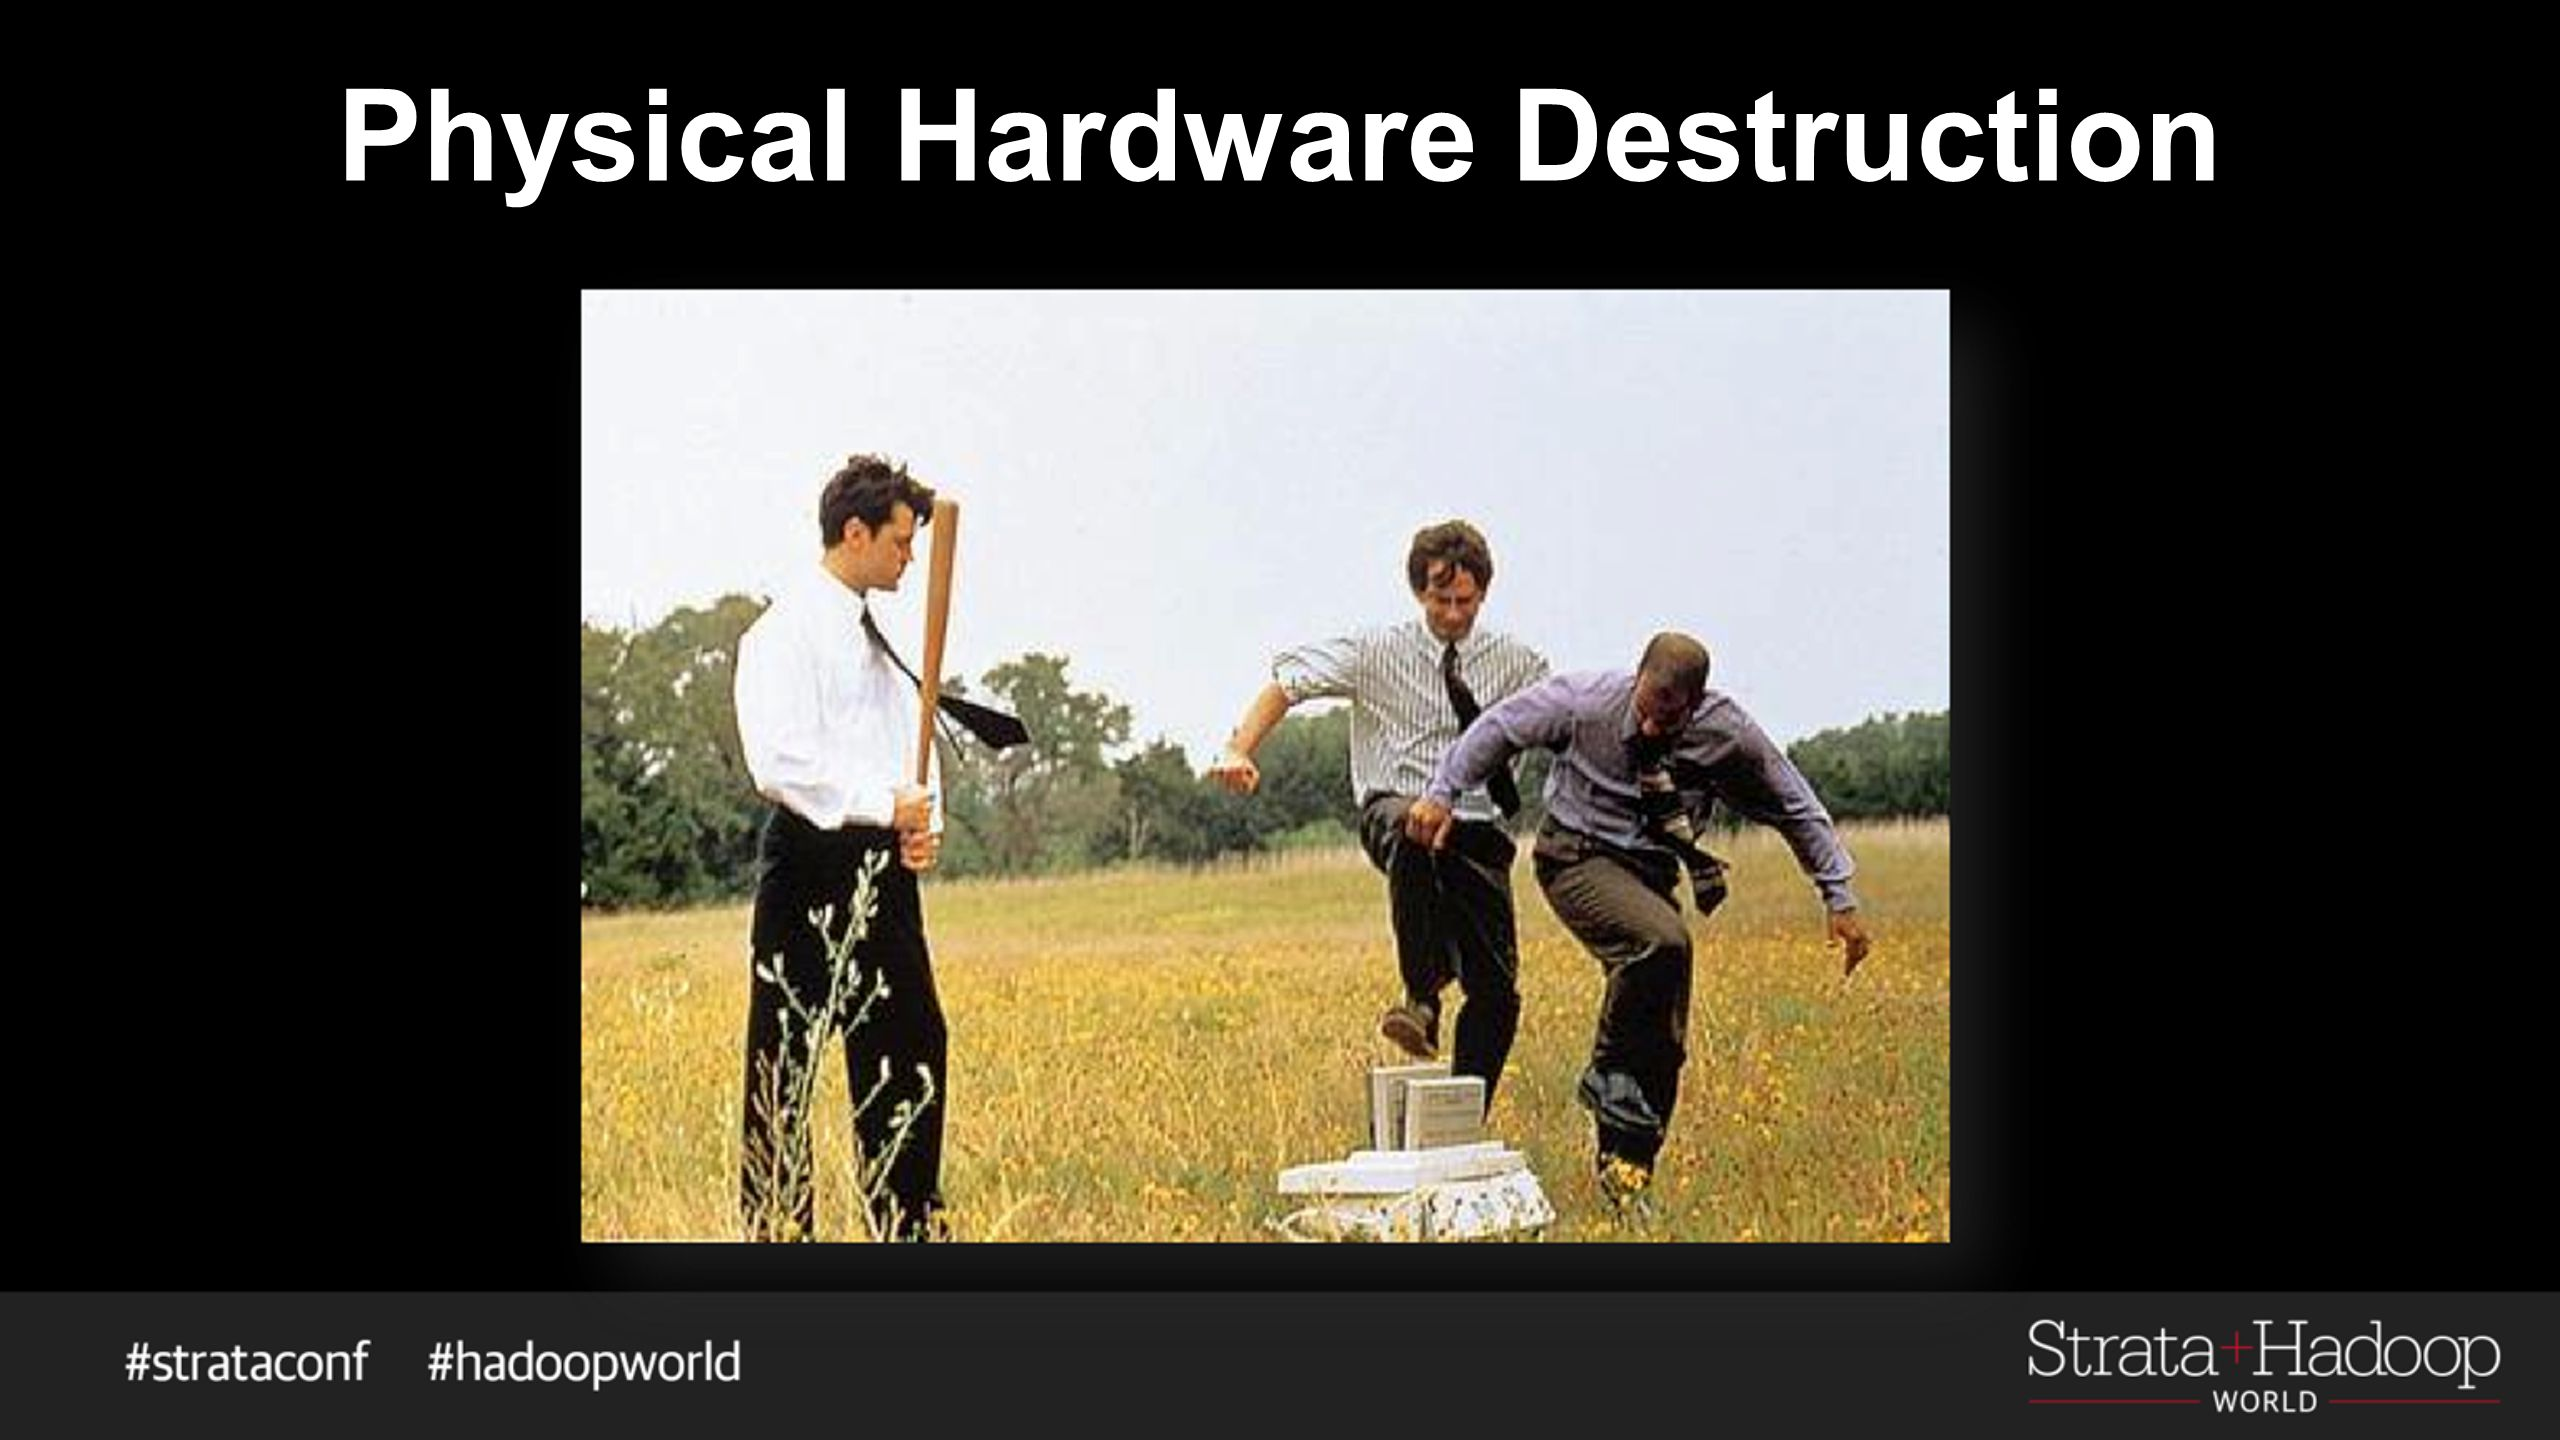 Physical Hardware Destruction